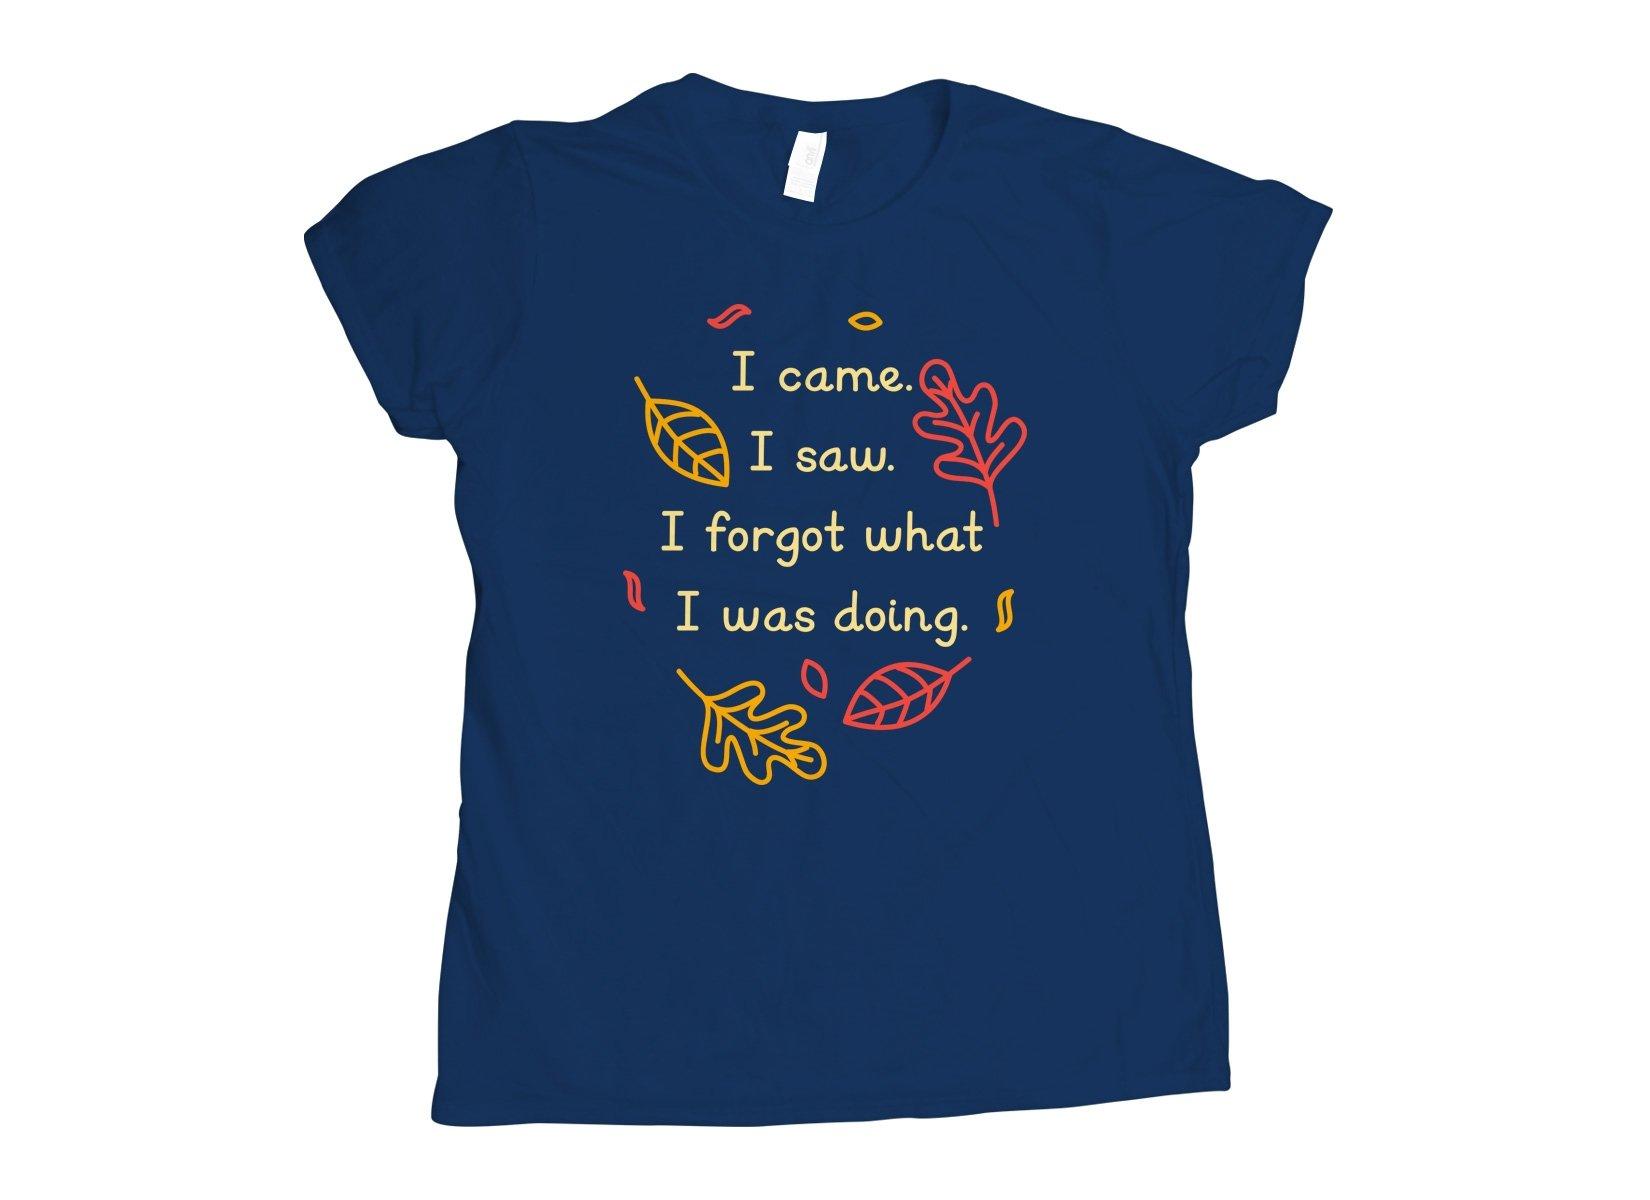 I Came. I Saw. I Forgot What I Was Doing. on Womens T-Shirt